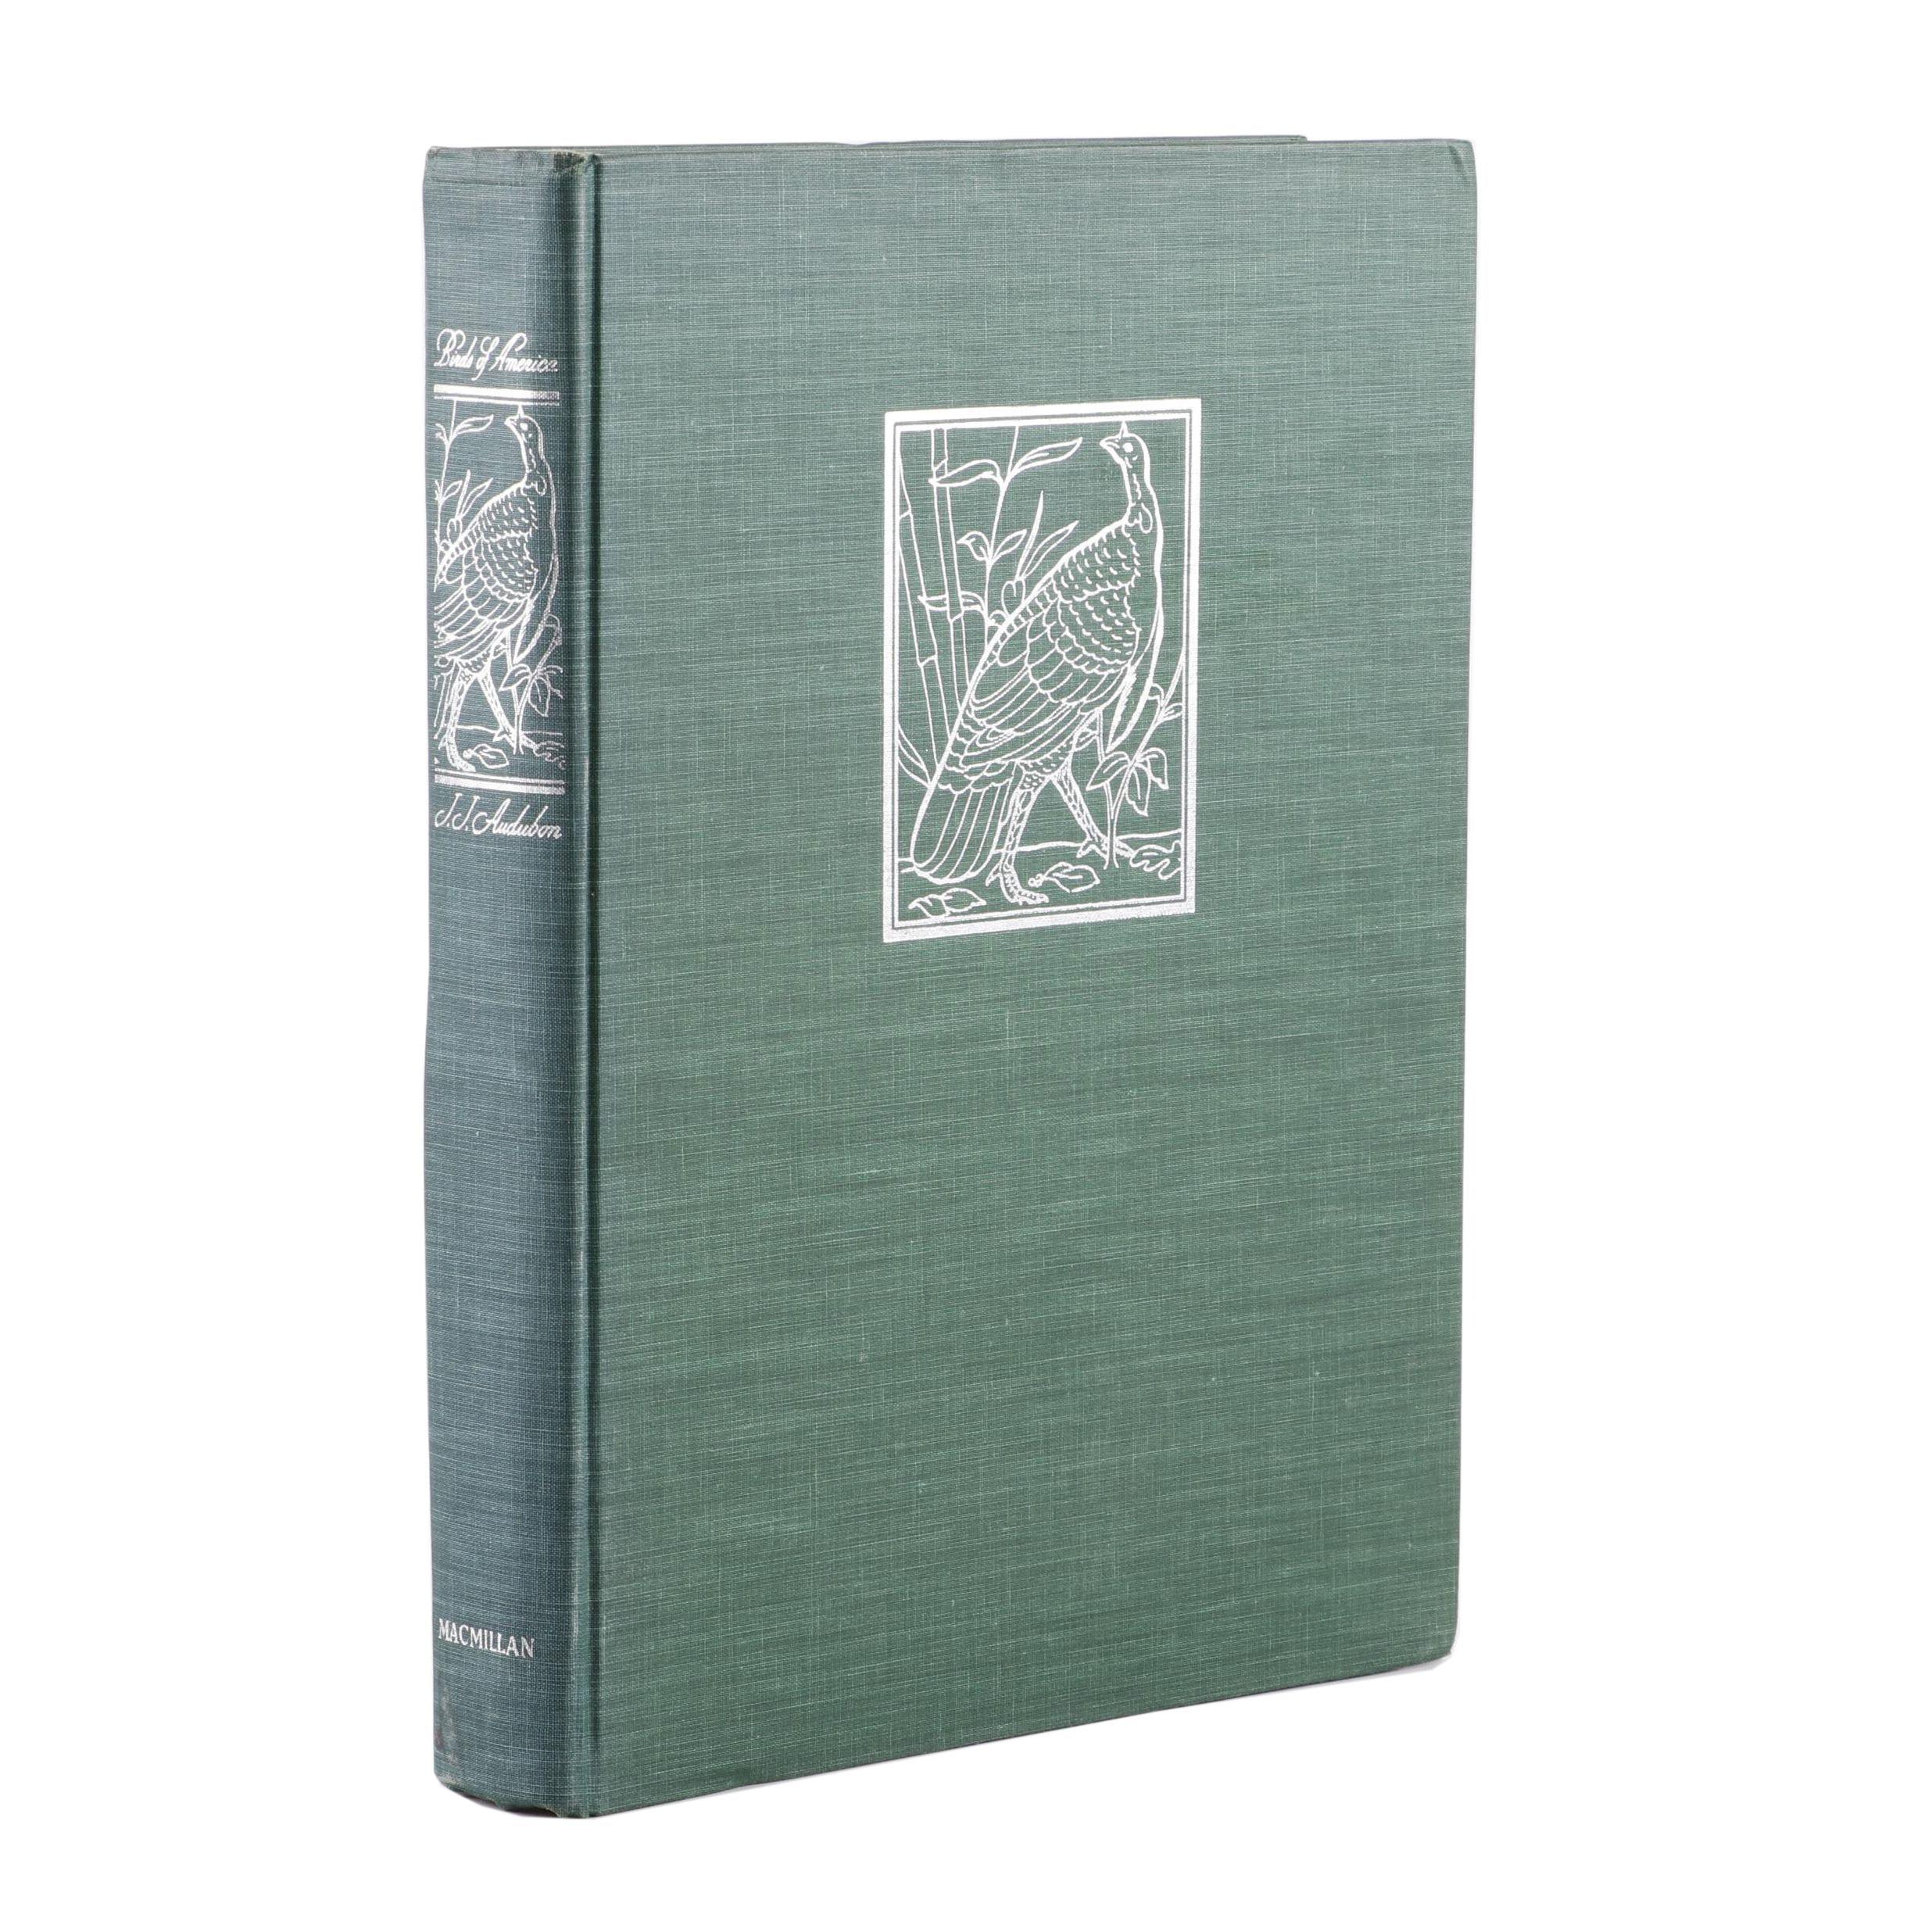 """The Birds of America"" by John James Audubon, 1937"